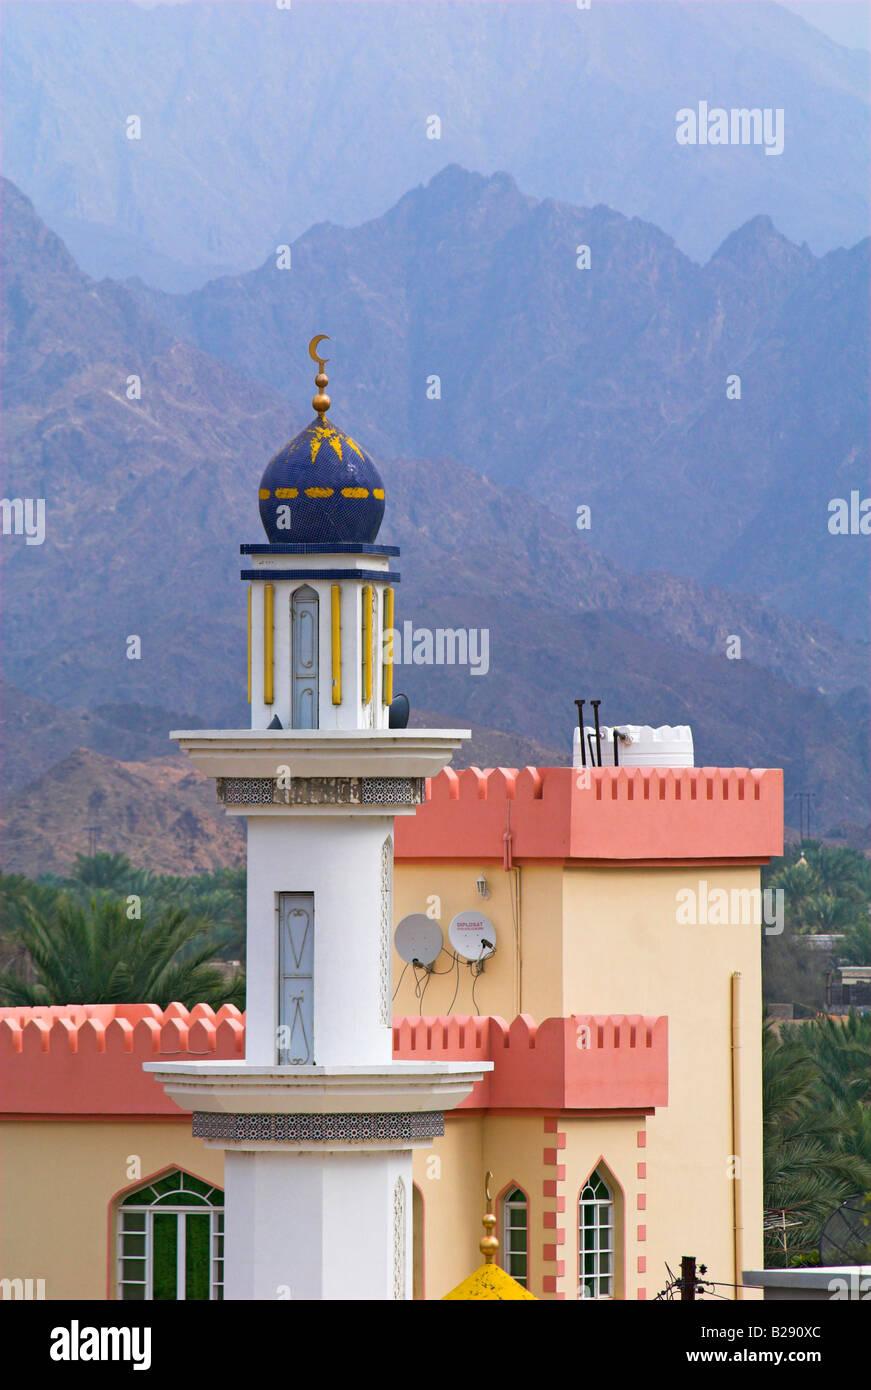 Mezquita y montañas Ar Rustaq Omán Fecha 12 03 2008 0016 111153 Ref ZB917 World Pictures Photoshot crédito Imagen De Stock